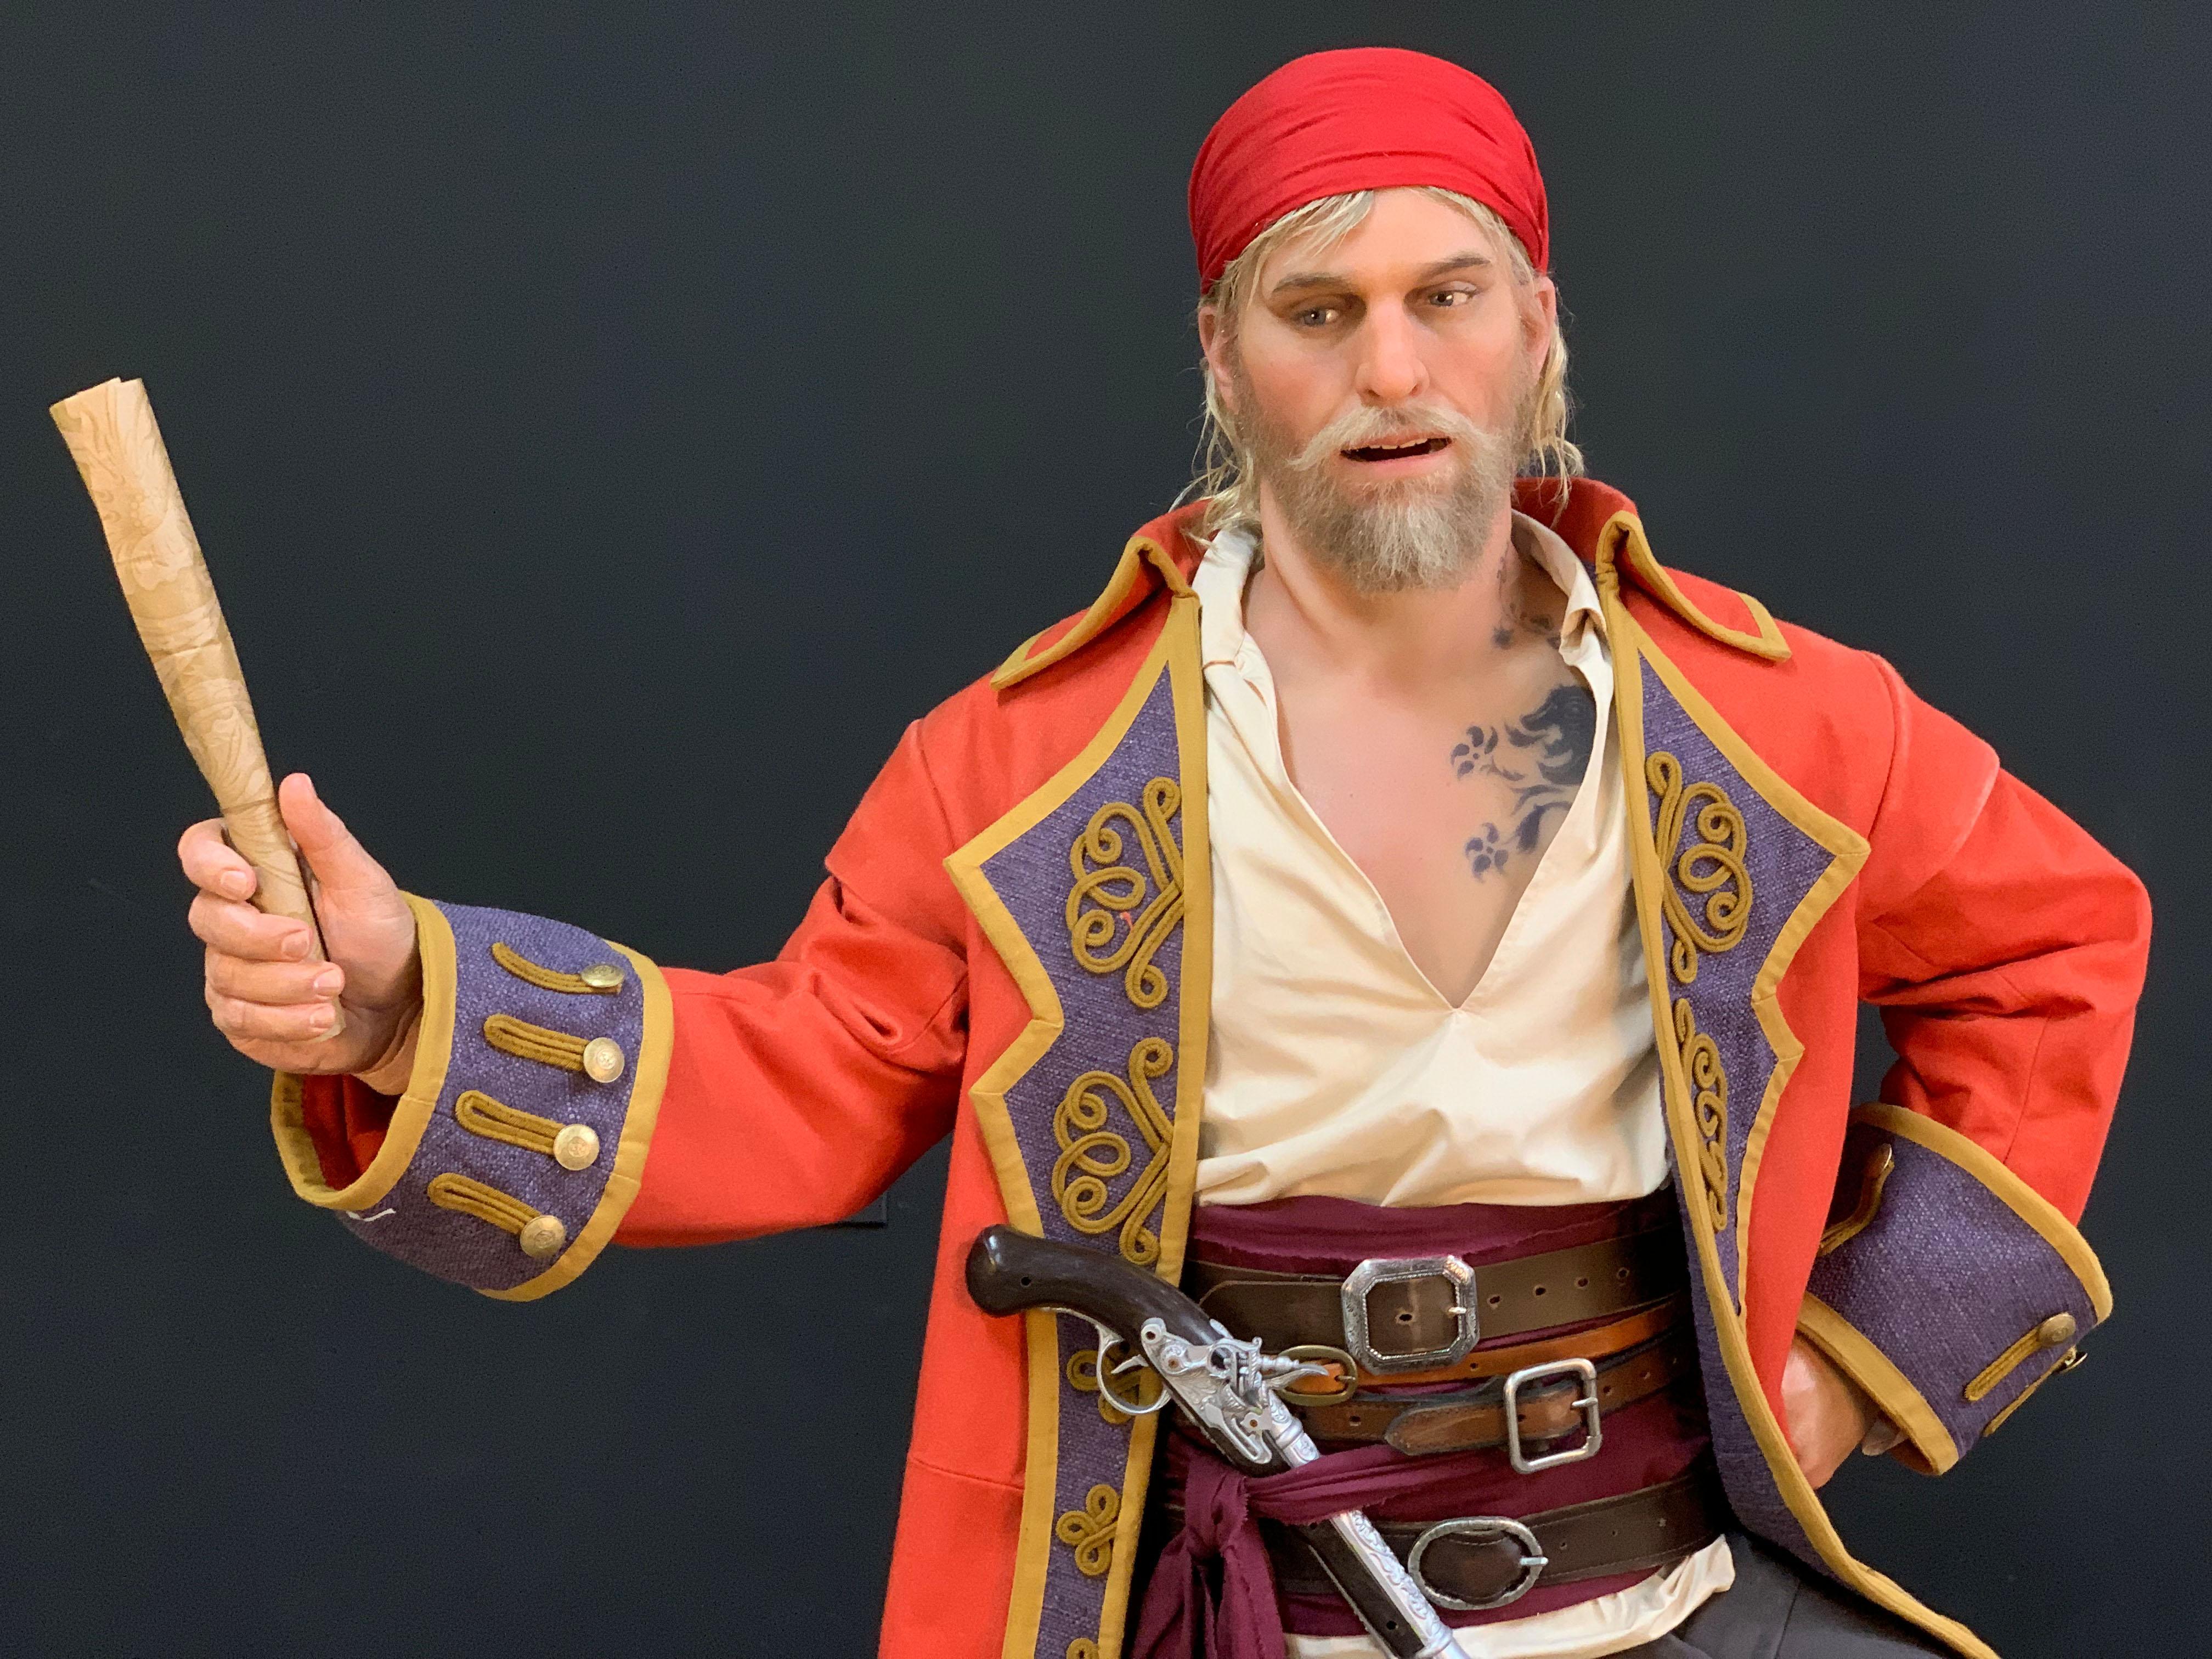 European Pirate